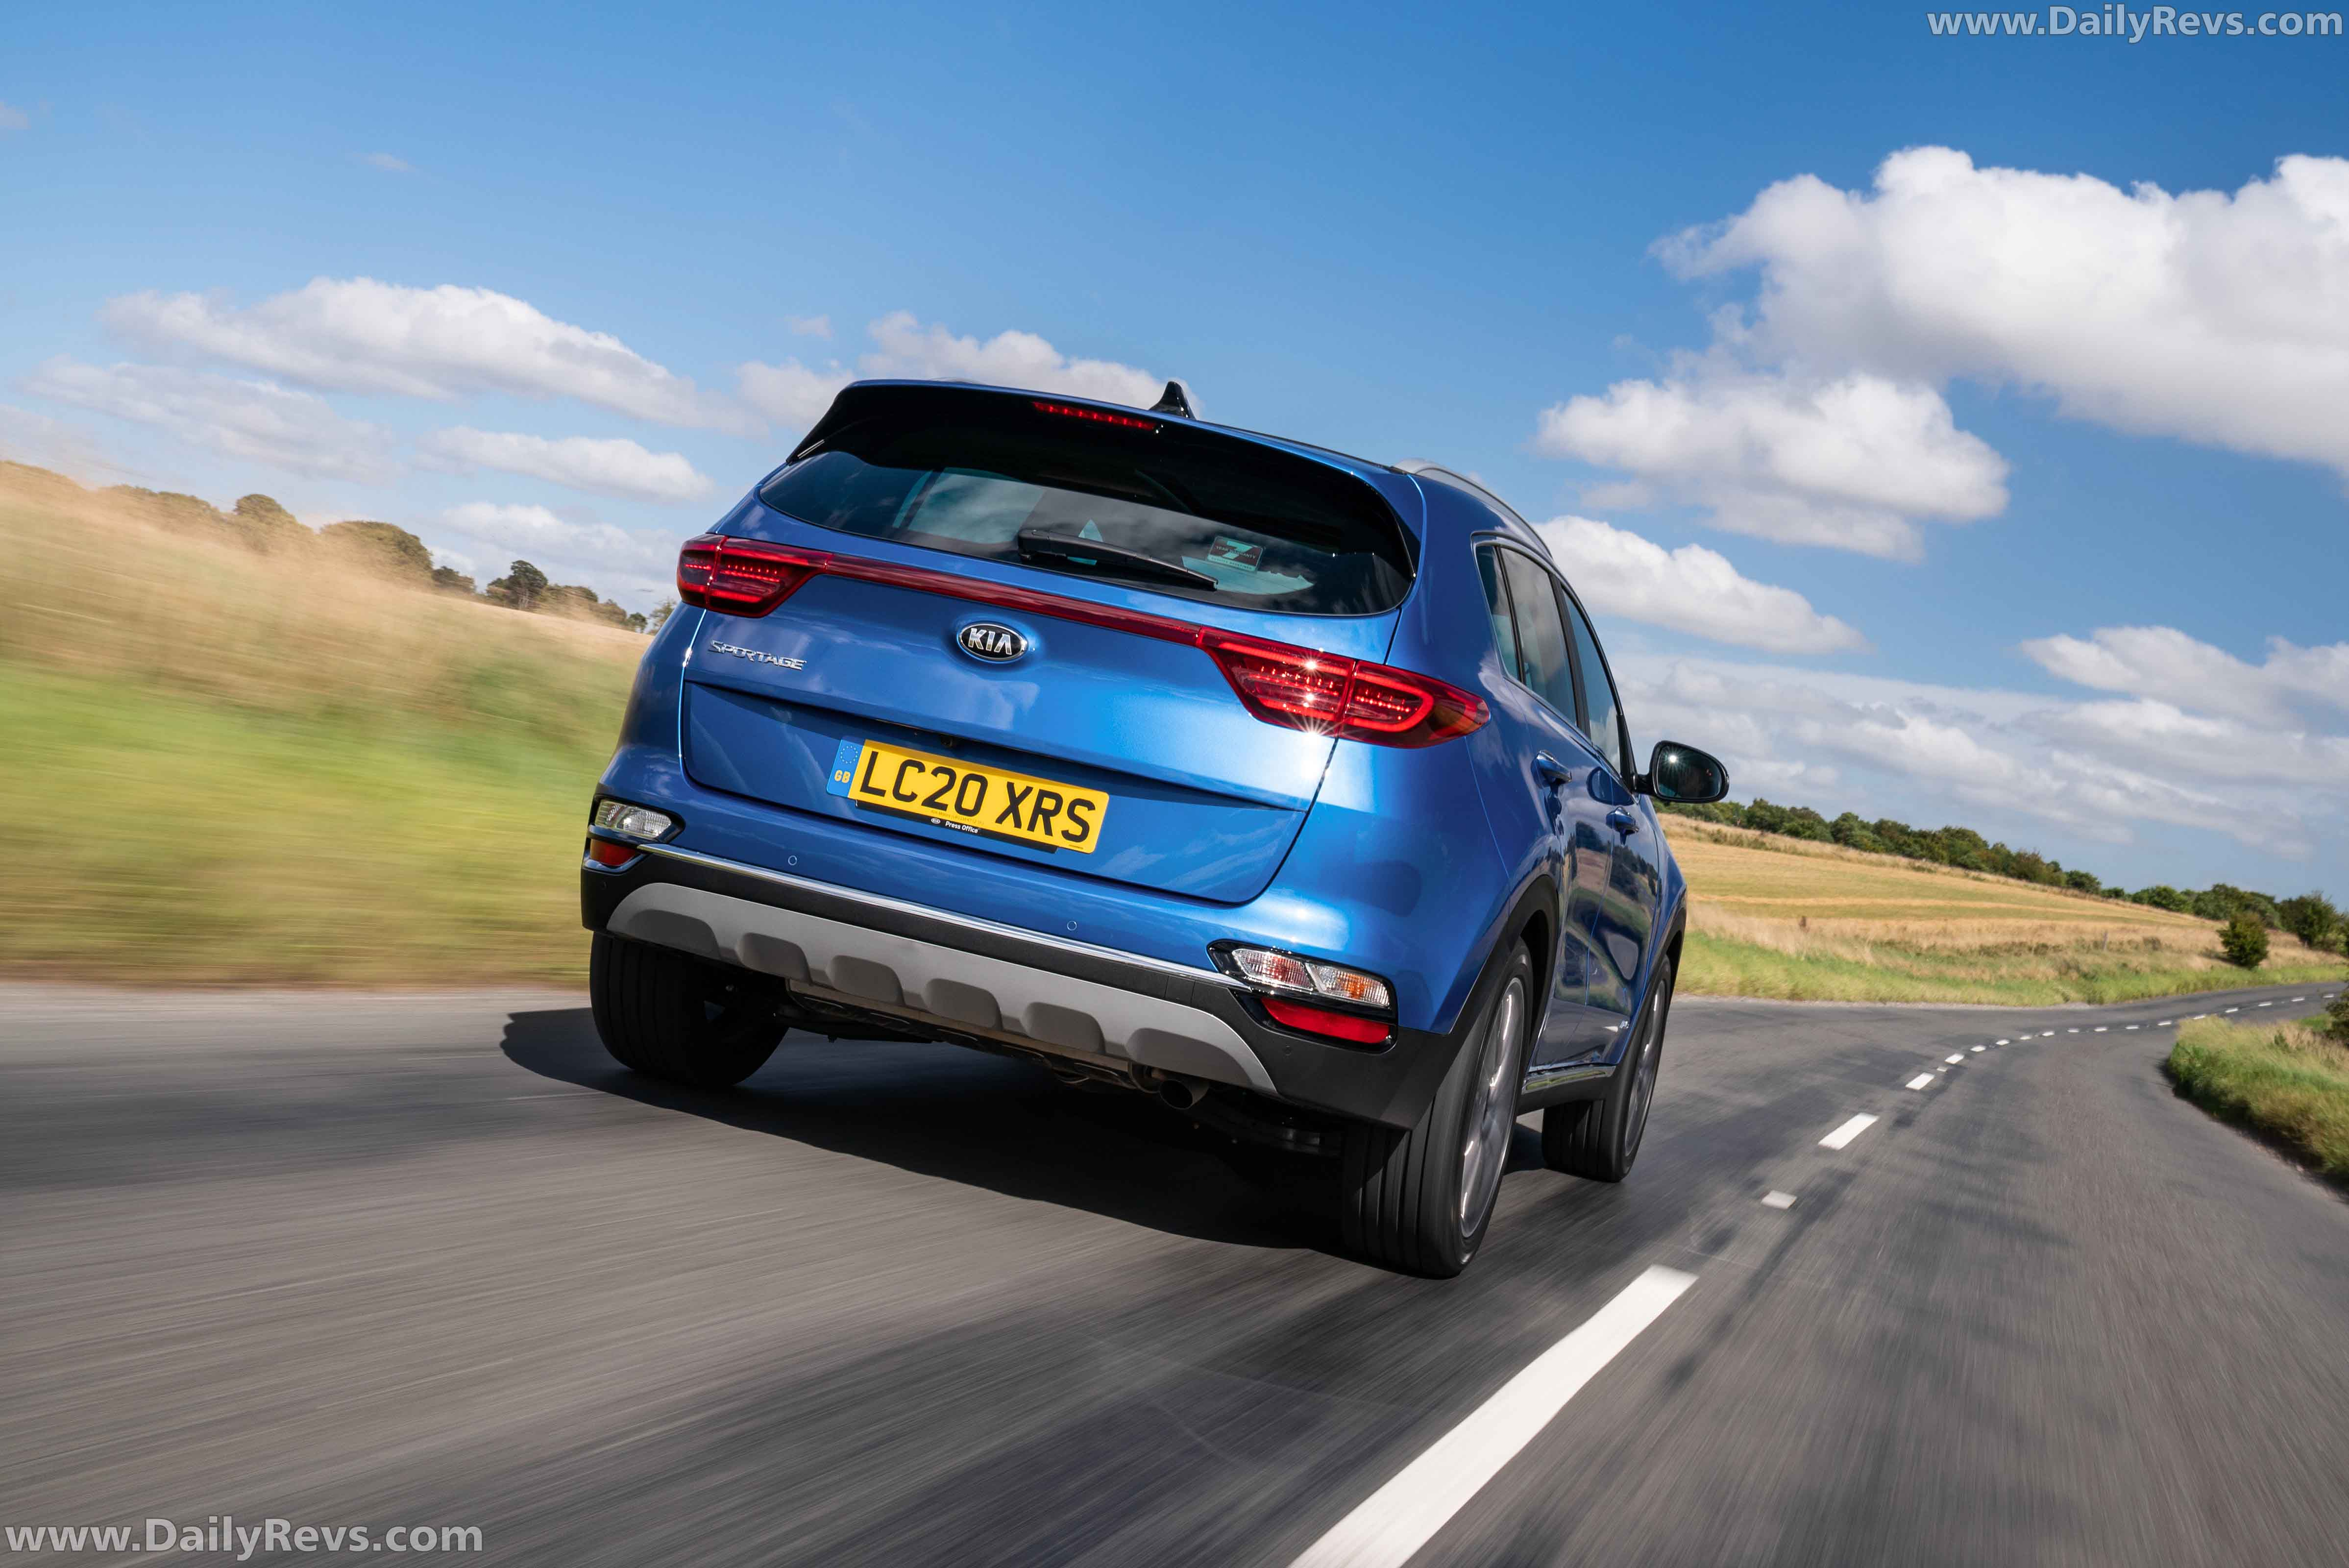 2020 Kia Sportage UK Version full